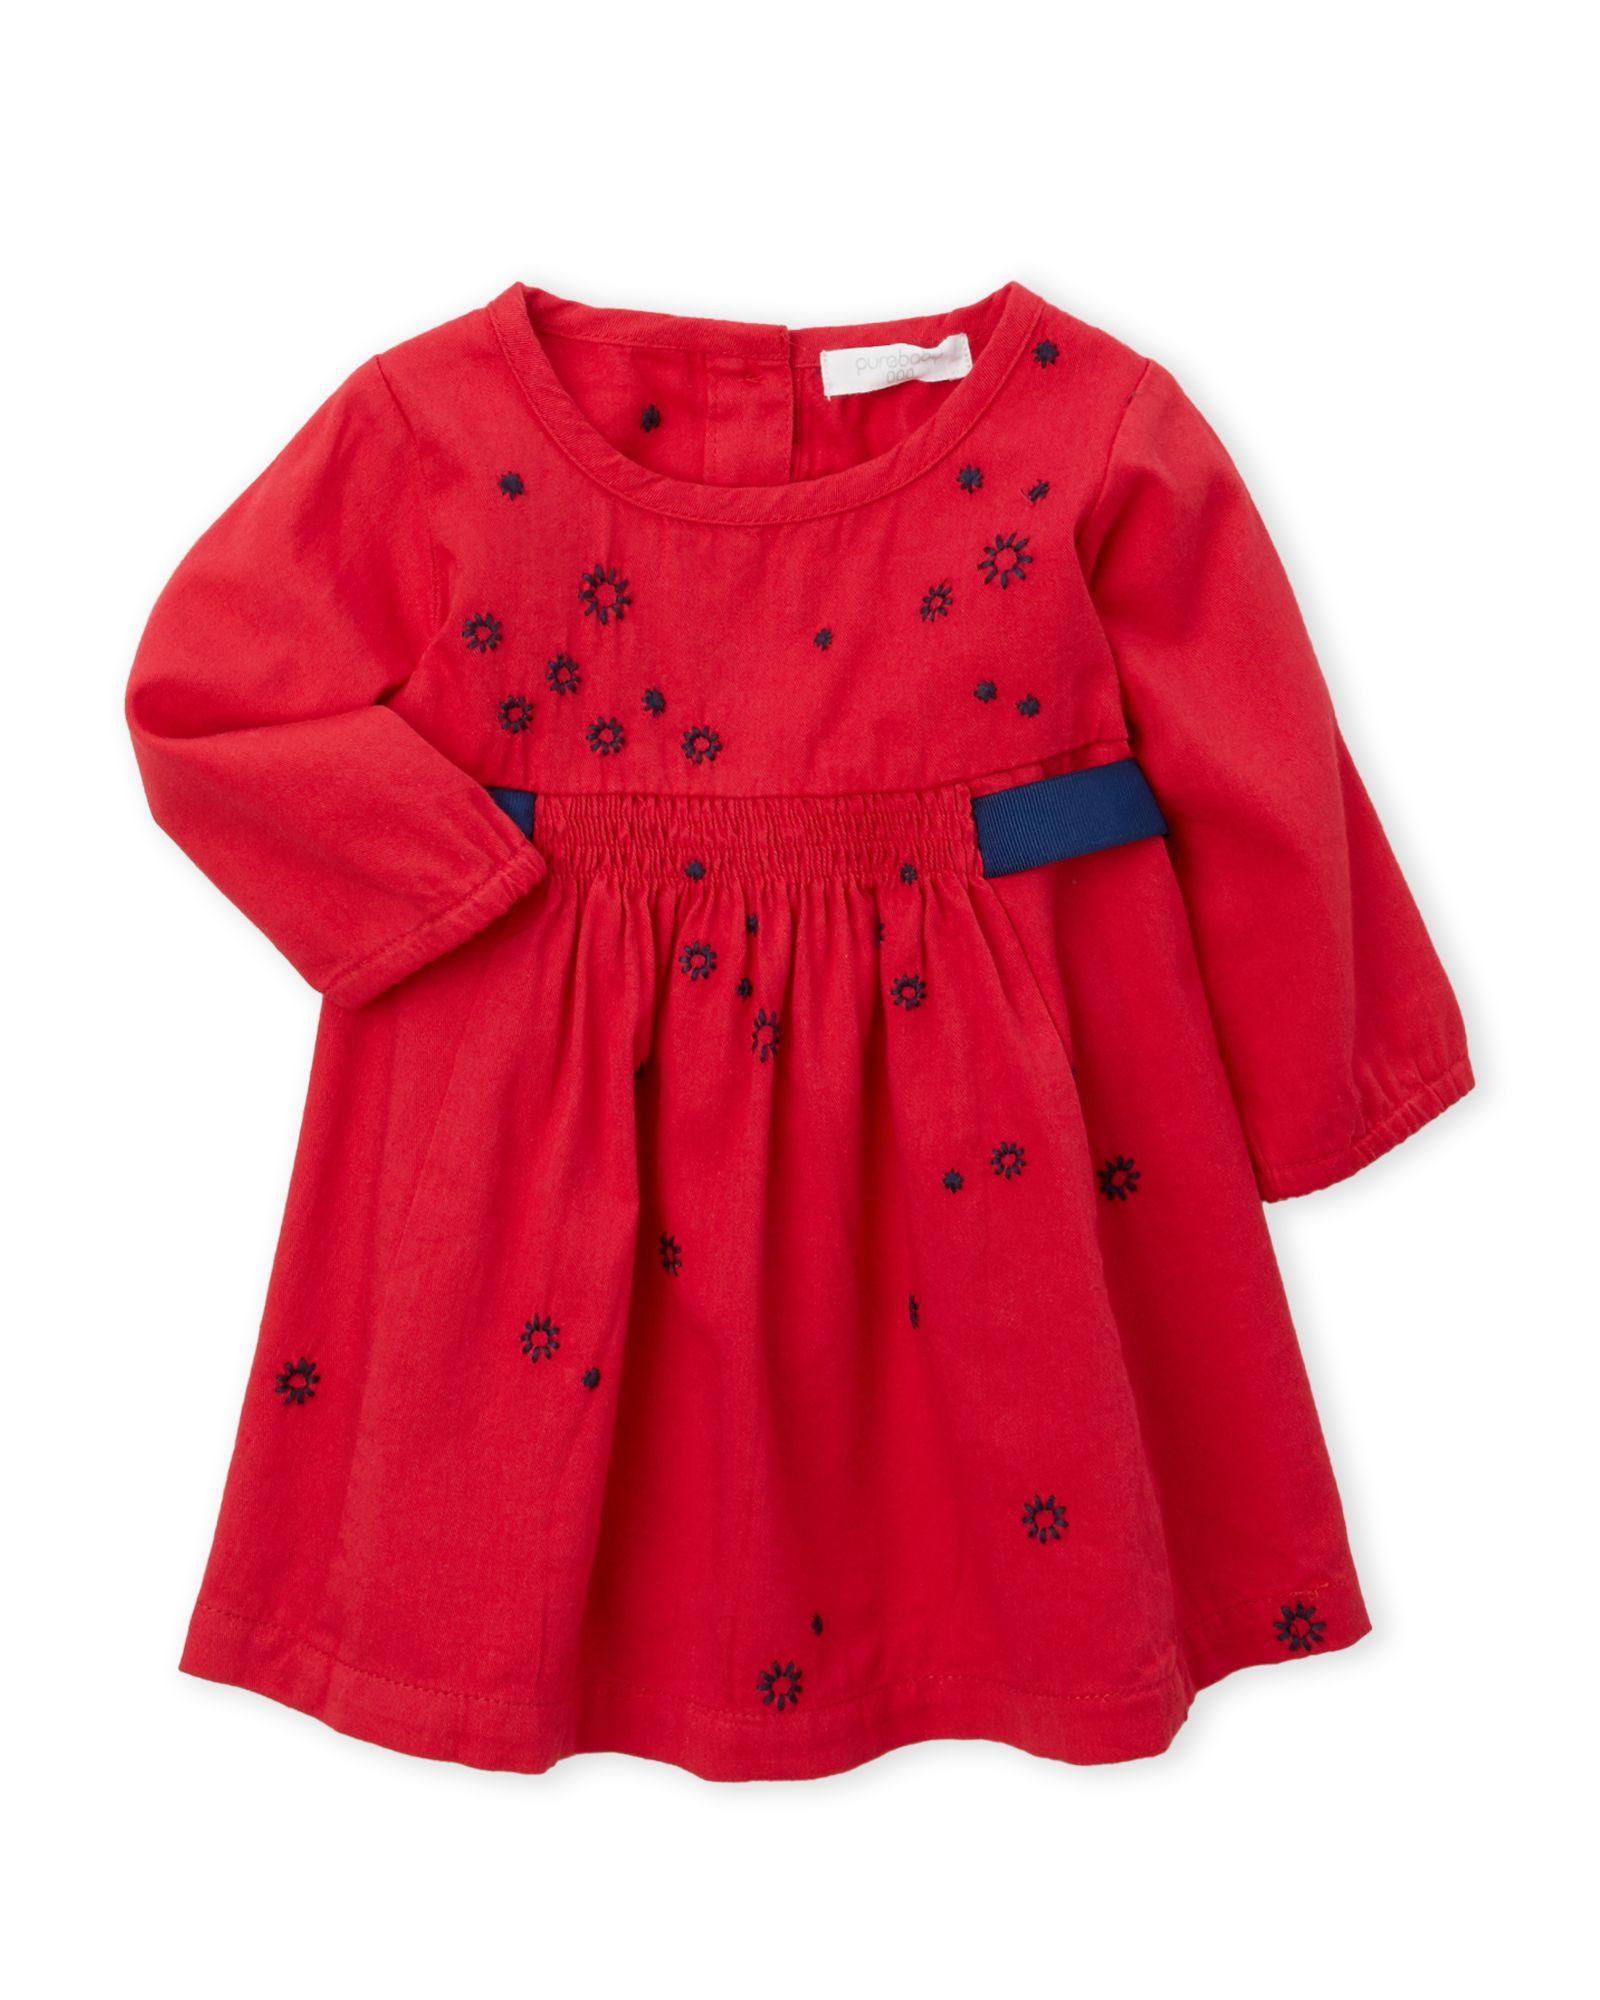 Purebaby Newborn Infant Girls Winter Sparkle Dress